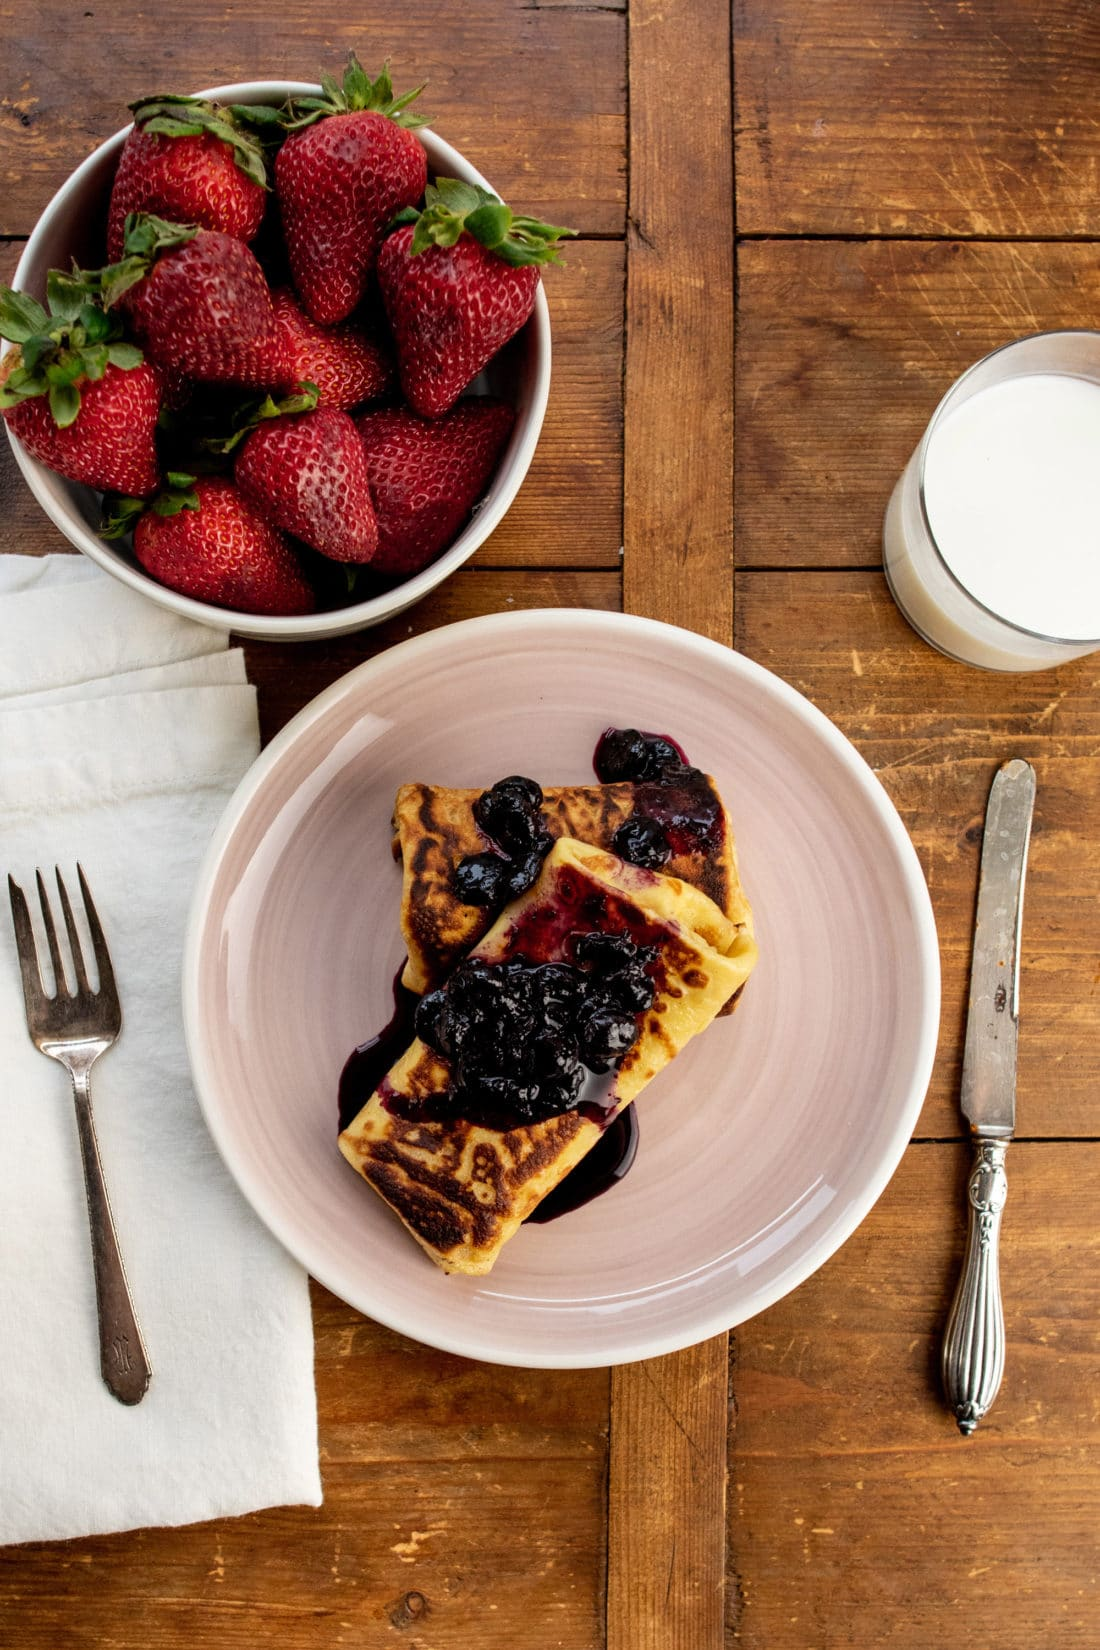 Creamy Stuffed Breakfast Crepes / Photo by Cheyenne Cohen / Katie Workman / themom100.com